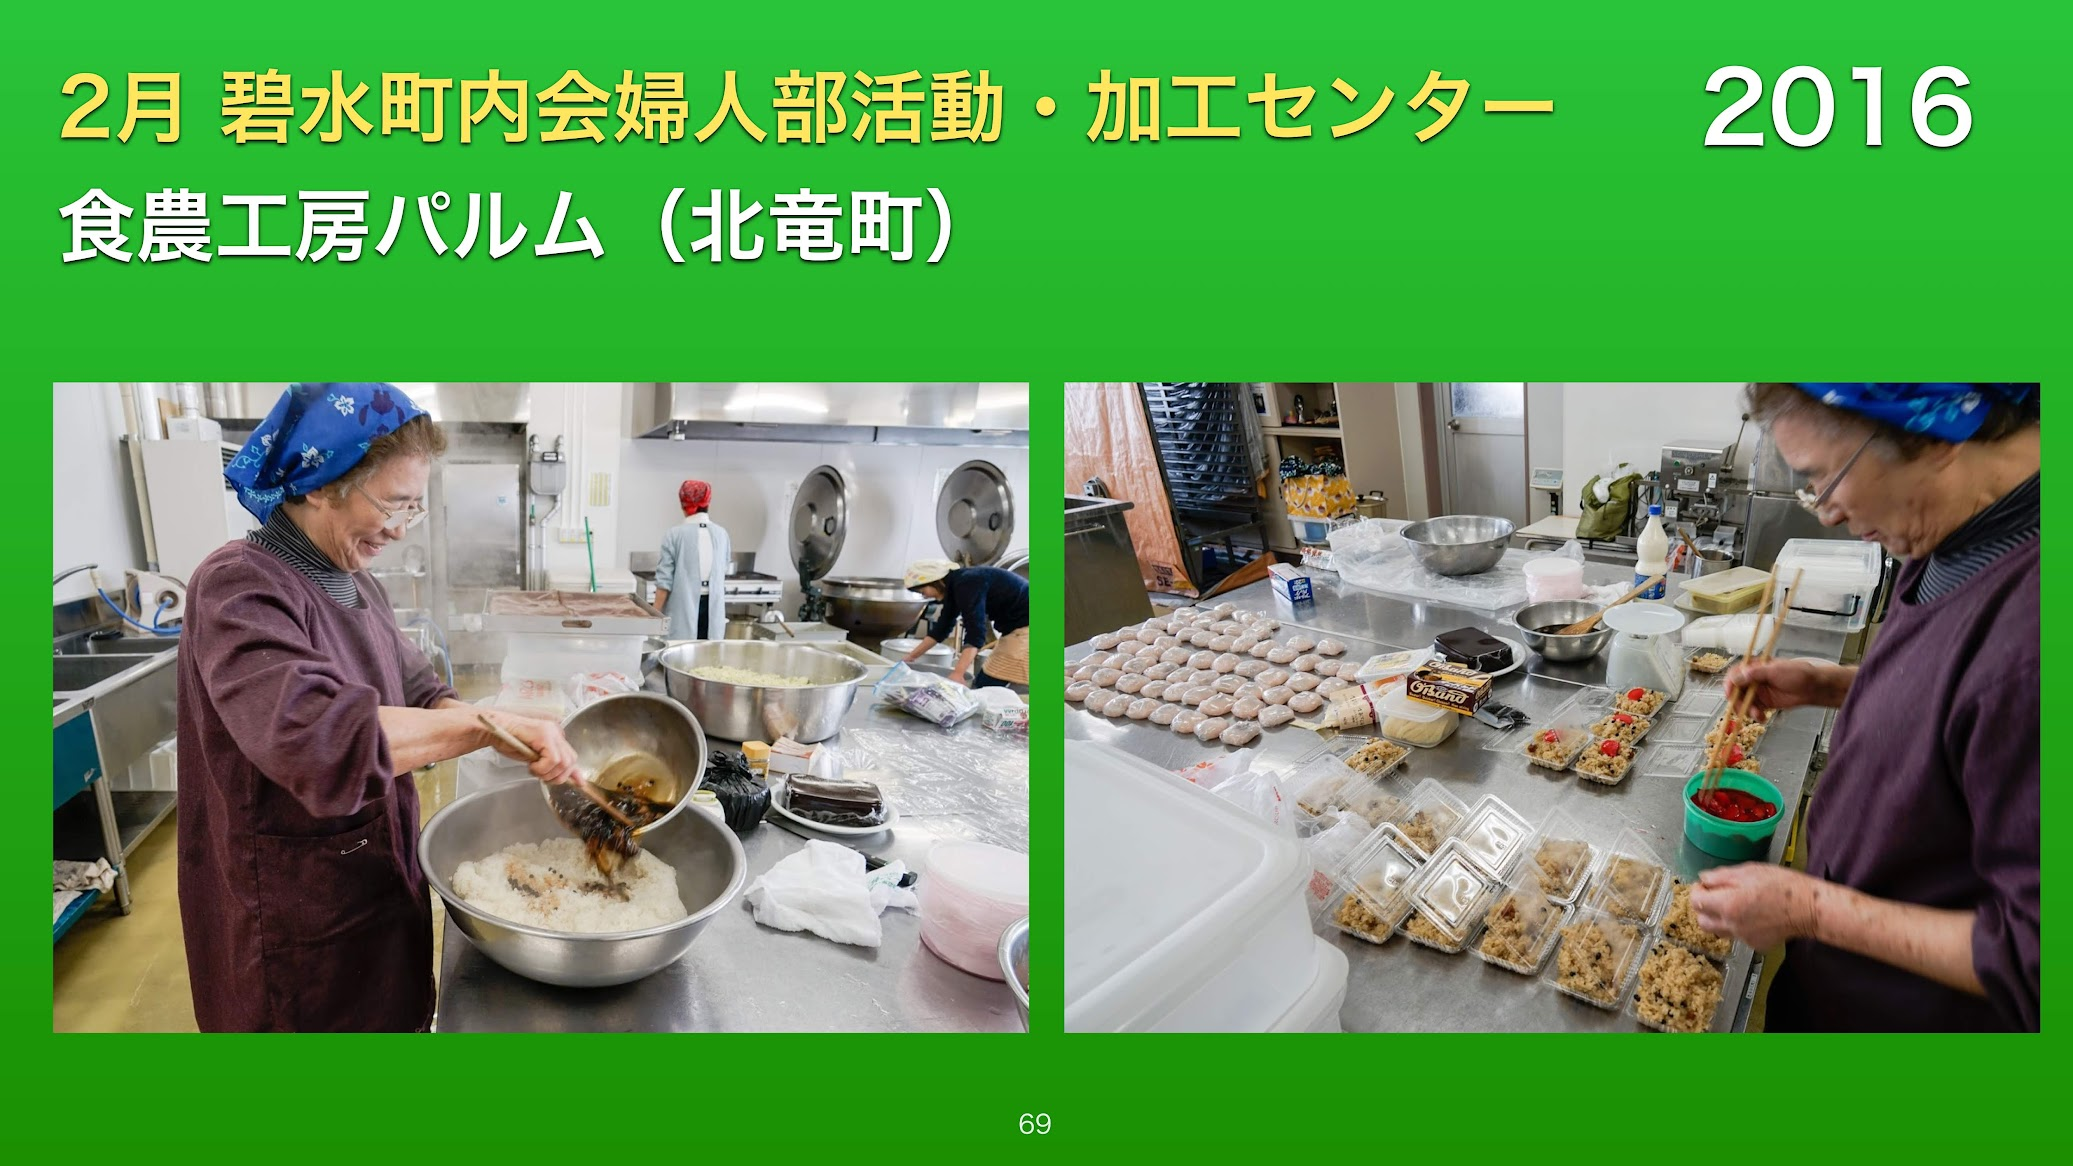 2月 碧水町内会婦人部活動・加工センター @食農工房パルム(北竜町)